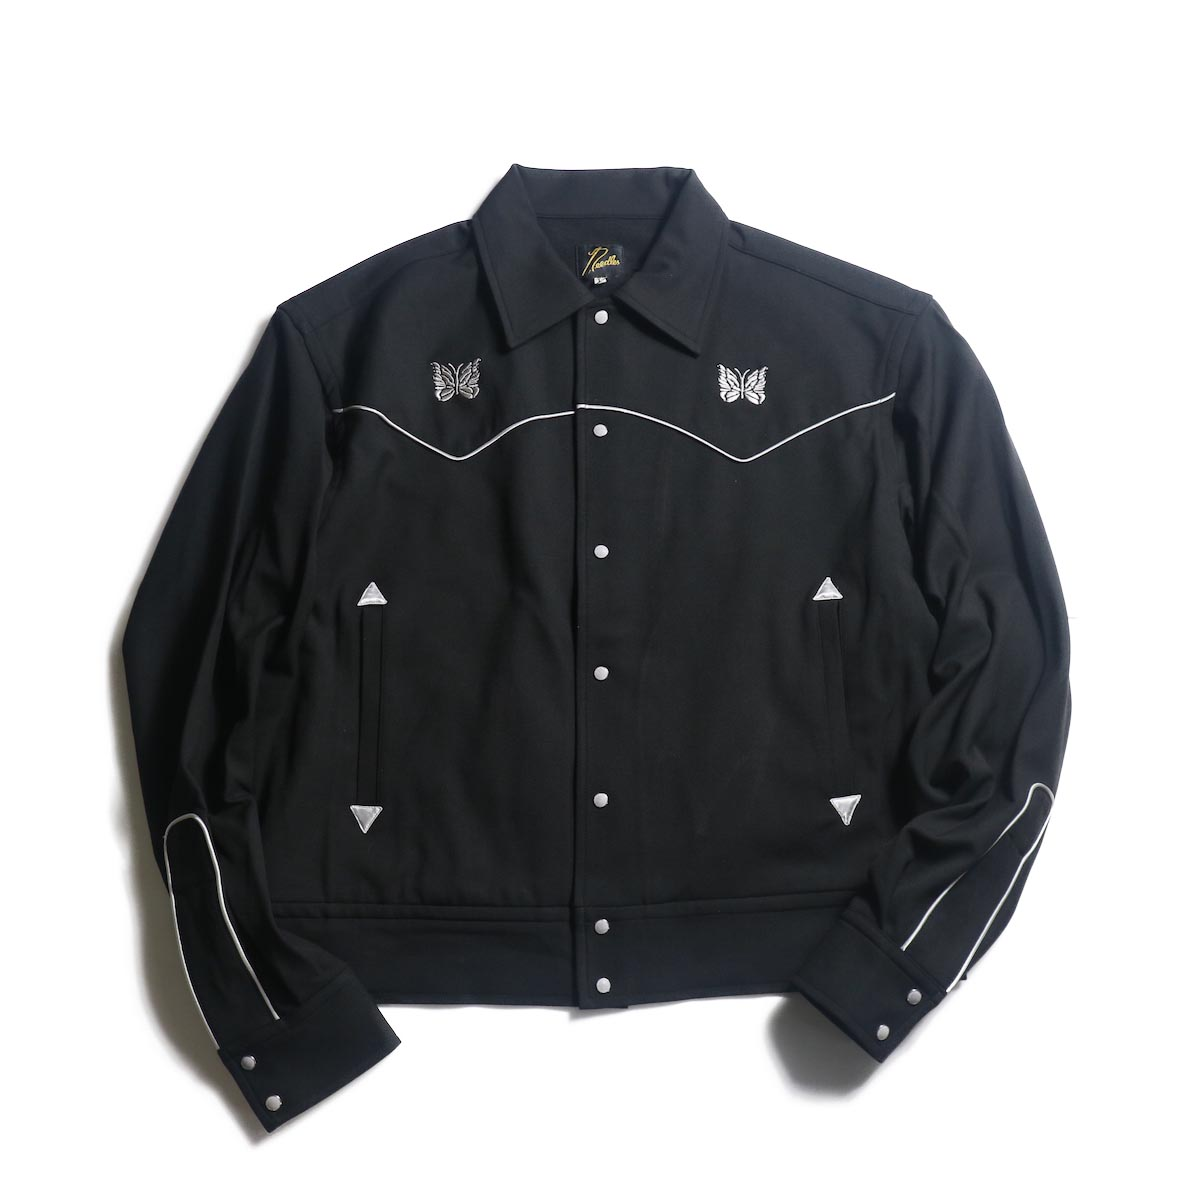 Needles / PIPING COWBOY JAC - PE/R/PU TWILL (Black)